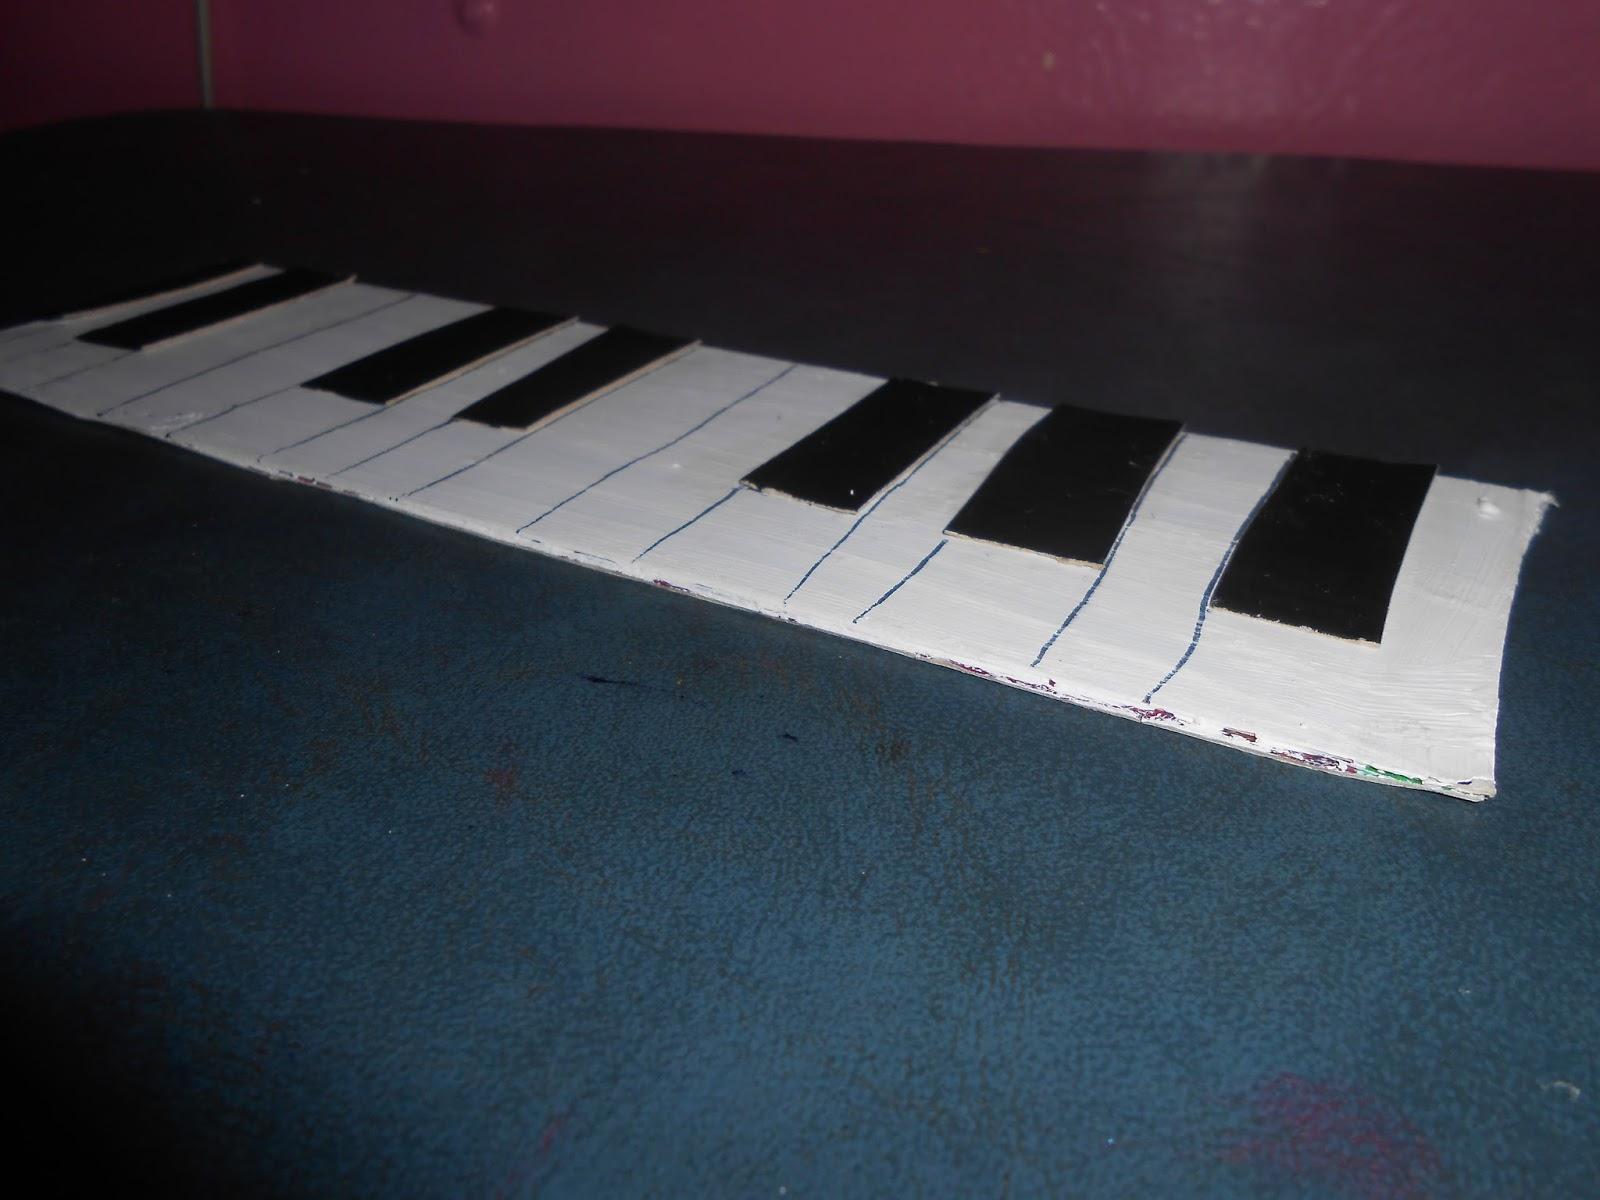 DIY Keyboard/Piano